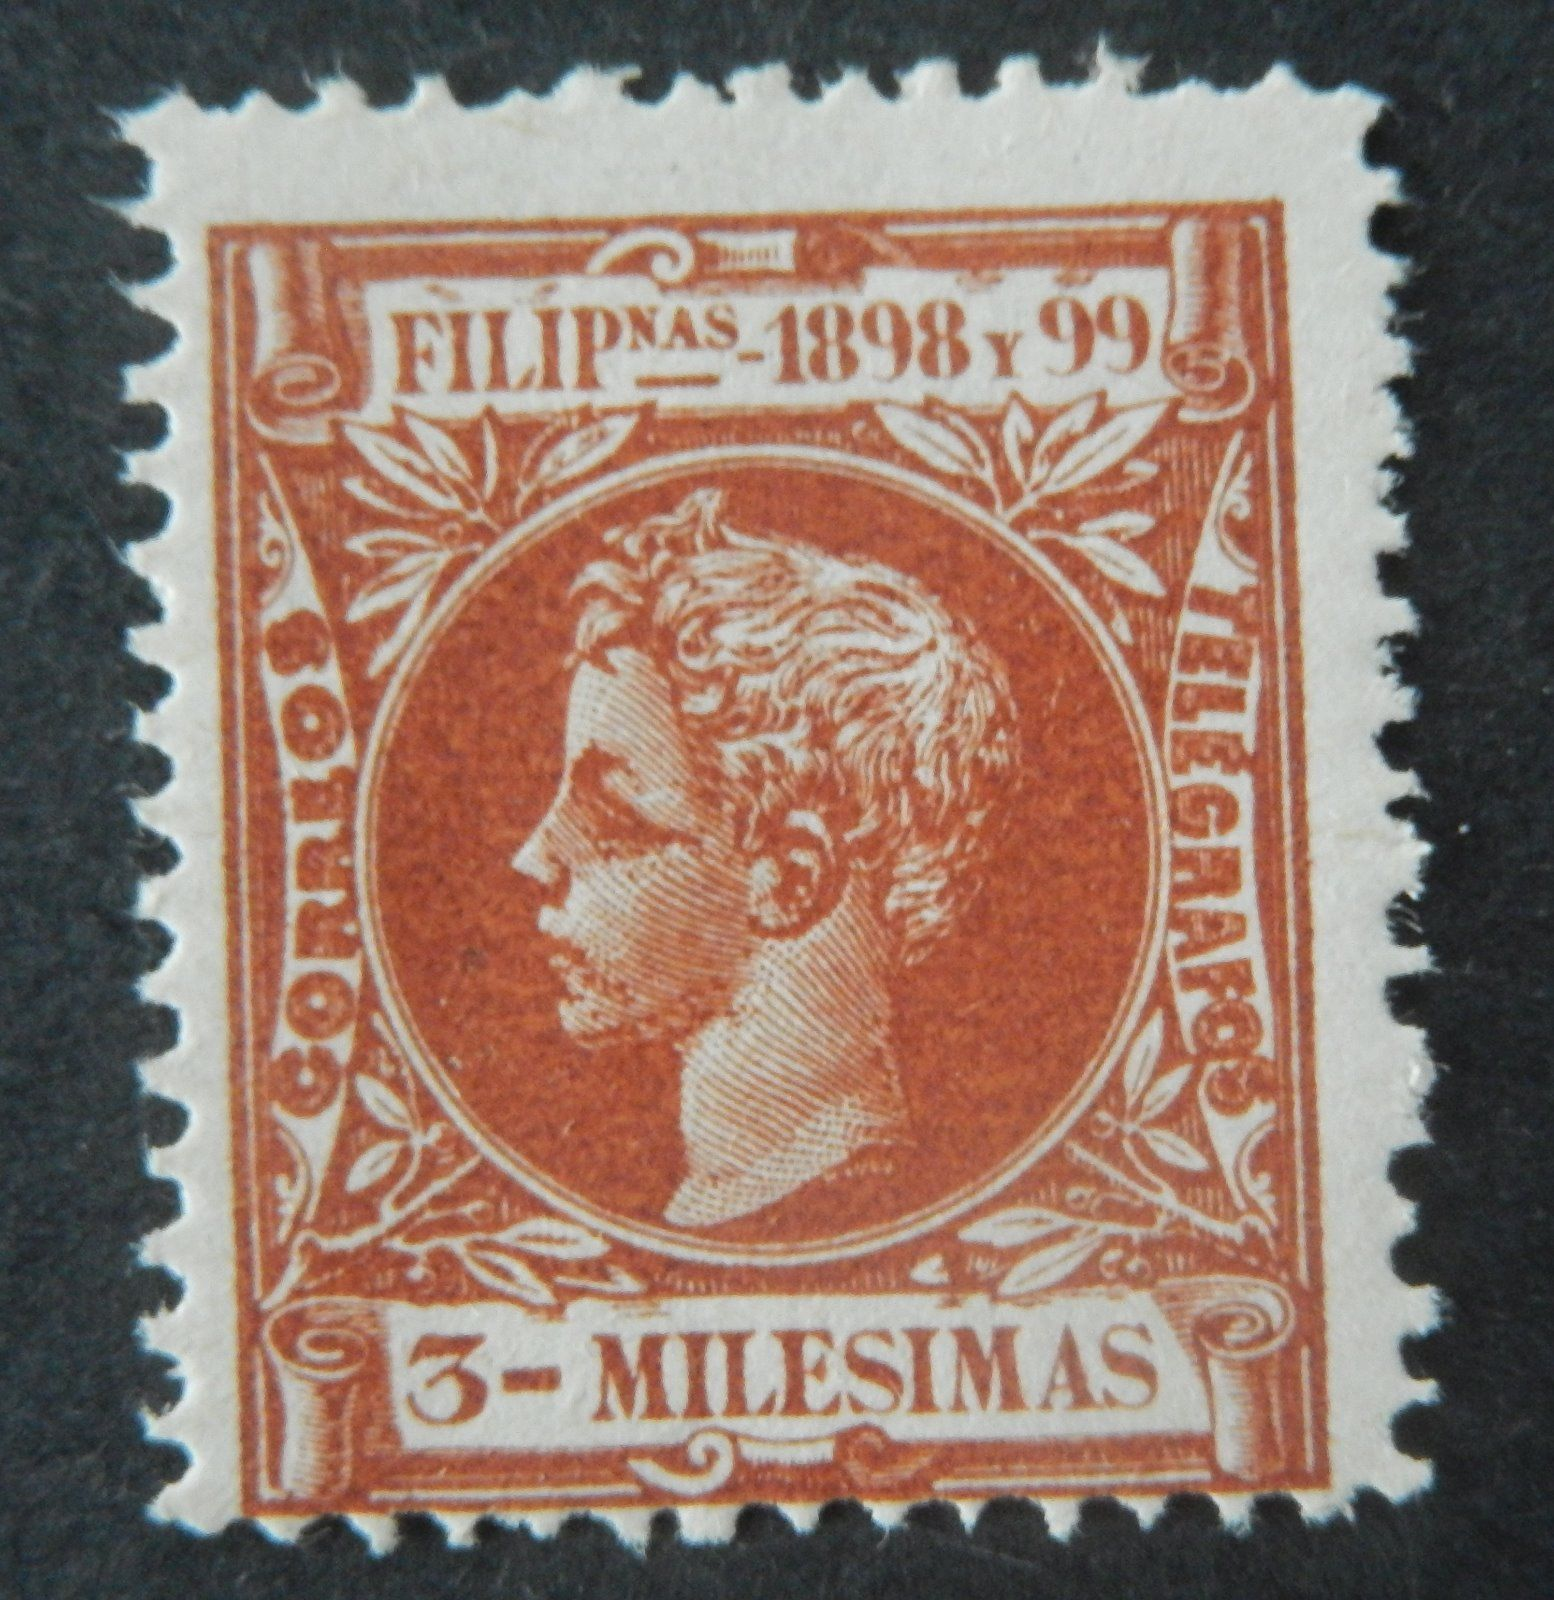 Philipppines Stamp Spanish Occupation 194 Mint Lightly Hinged Original Gum   eBay